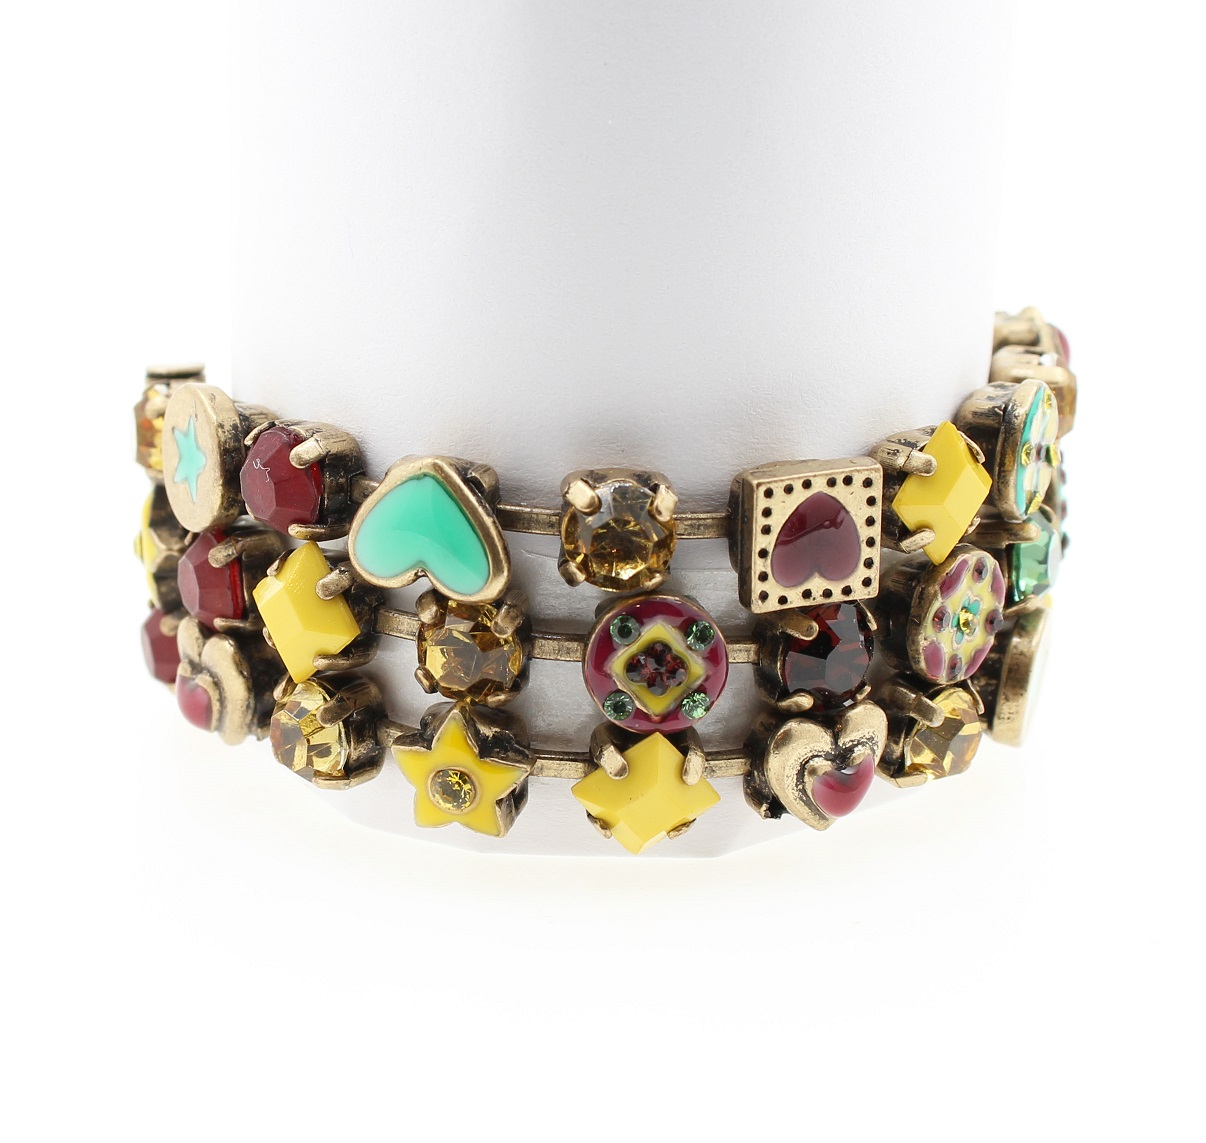 Pilgrim Bracelet - VICTORIAN PROMISES - Oxidised Gold Plate, Turquoise, Yellow & Raspberry BNWT